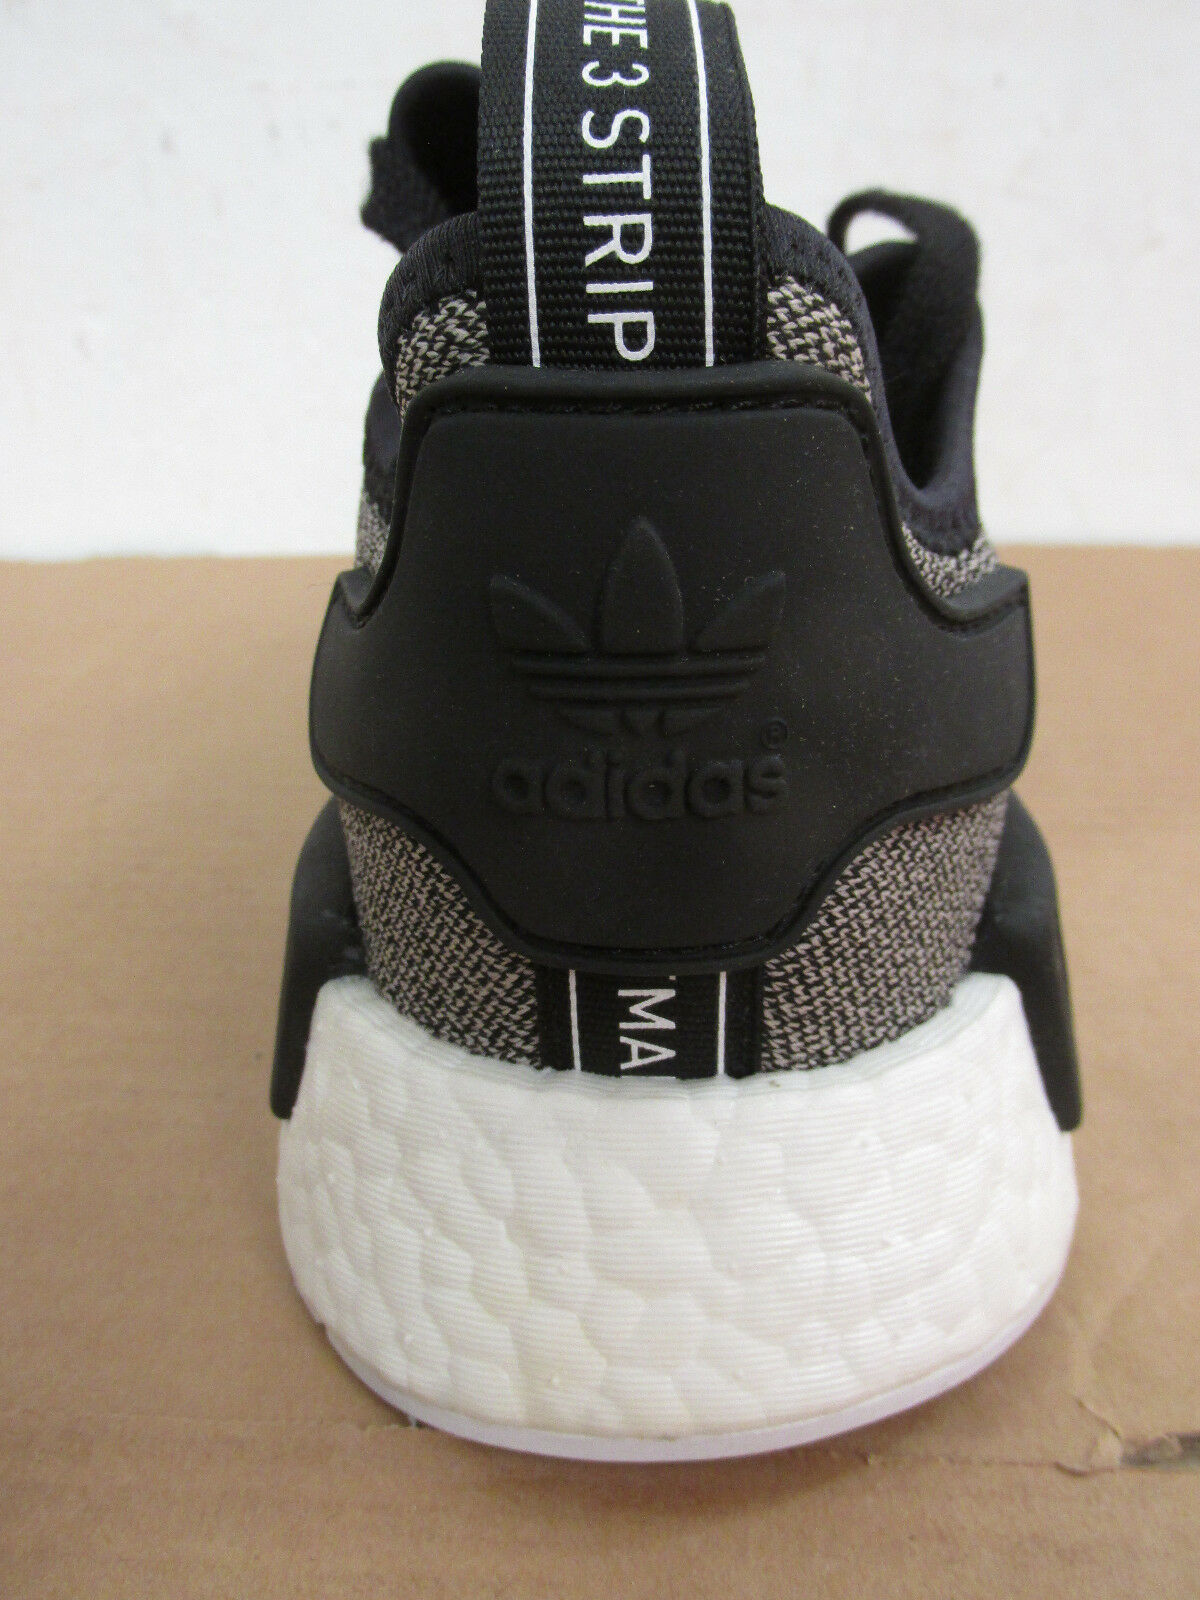 Adidas Nmd_R1 Original Nmd_R1 Adidas Damen Laufschuhe Turnschuhe BA7476 Sneakers Räumung e5374f